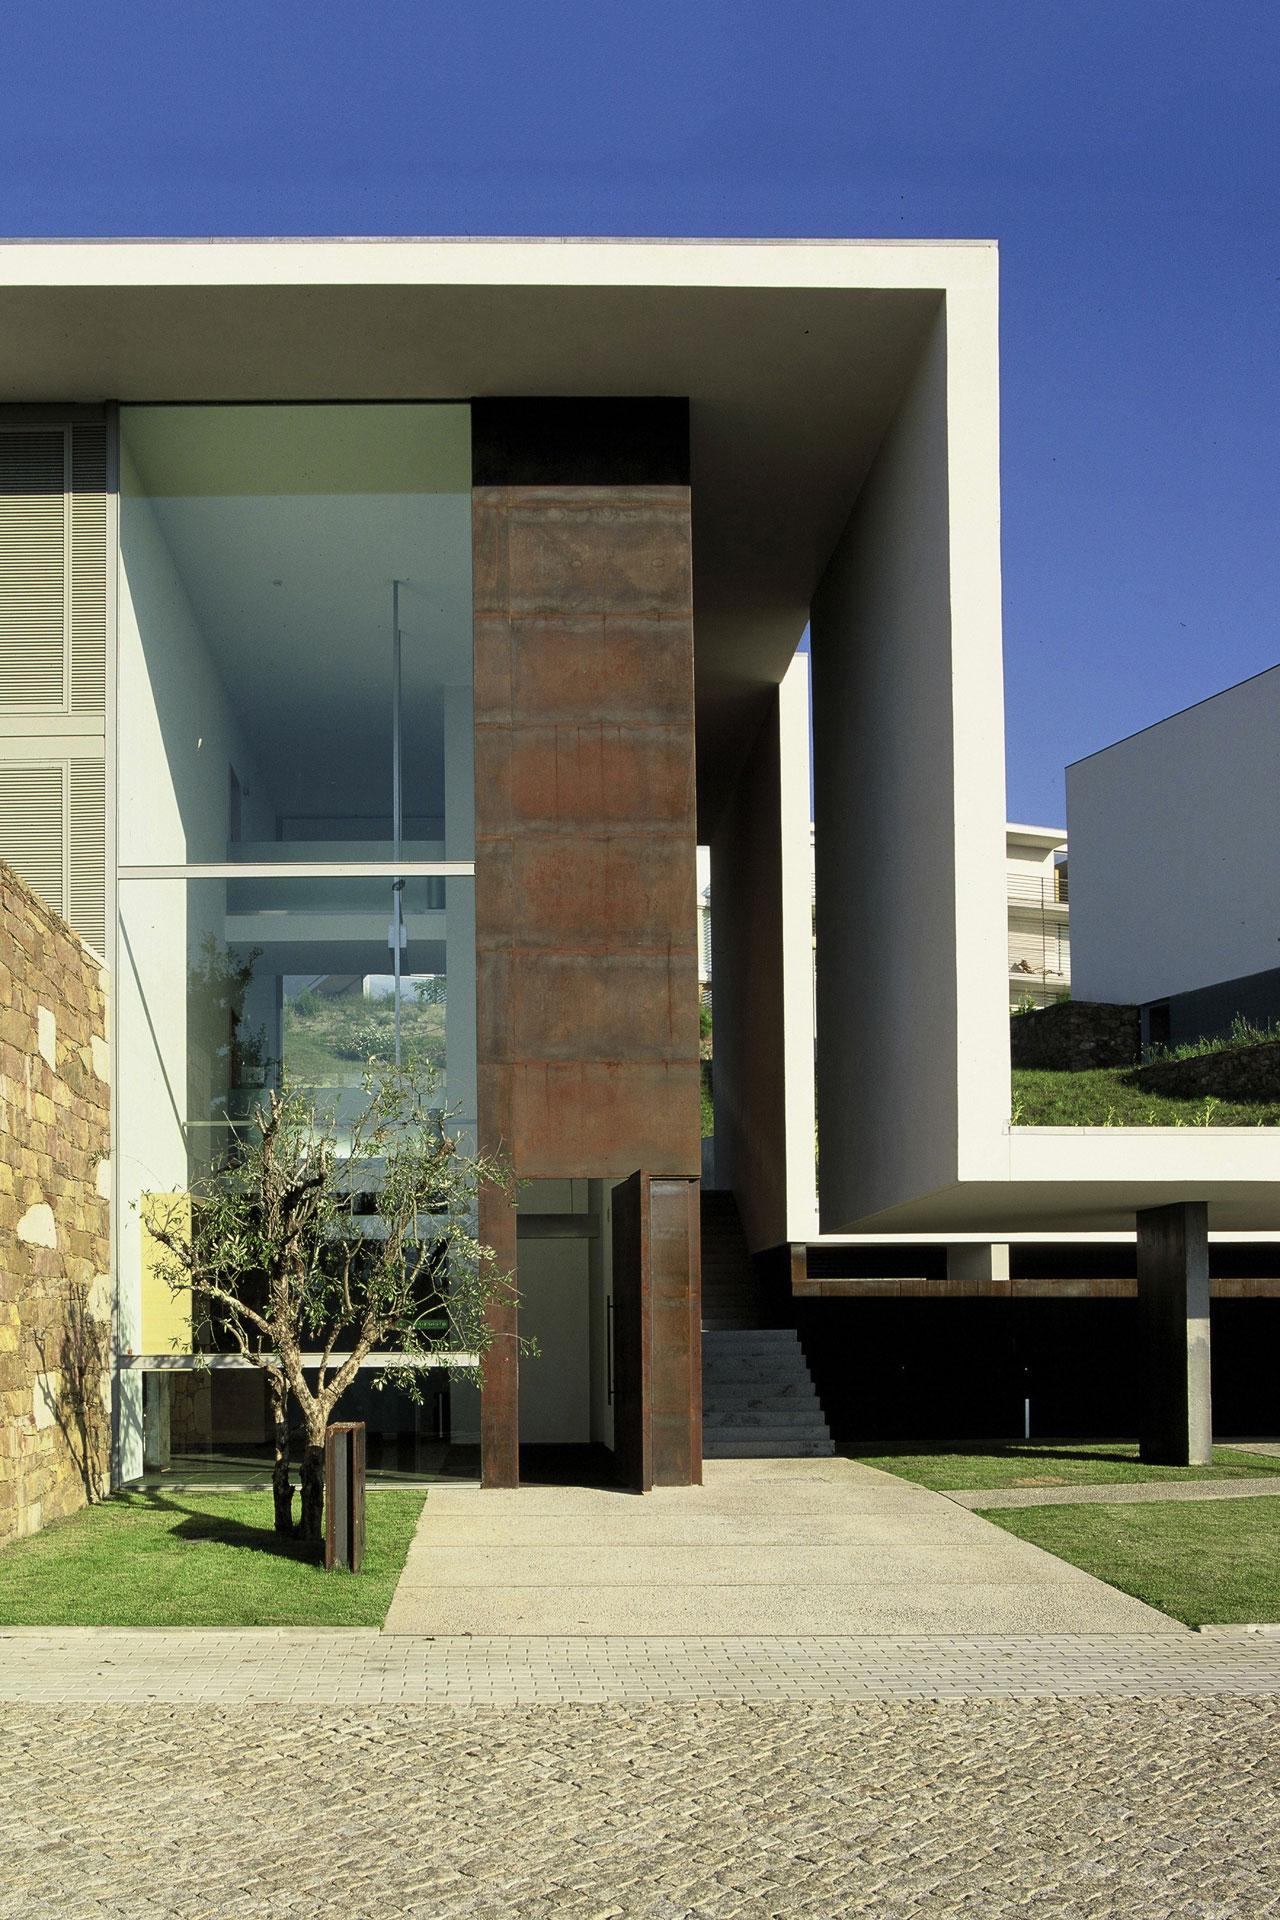 Hotel do Golfe / Topos Atelier de Arquitectura, © Xavier Antunes